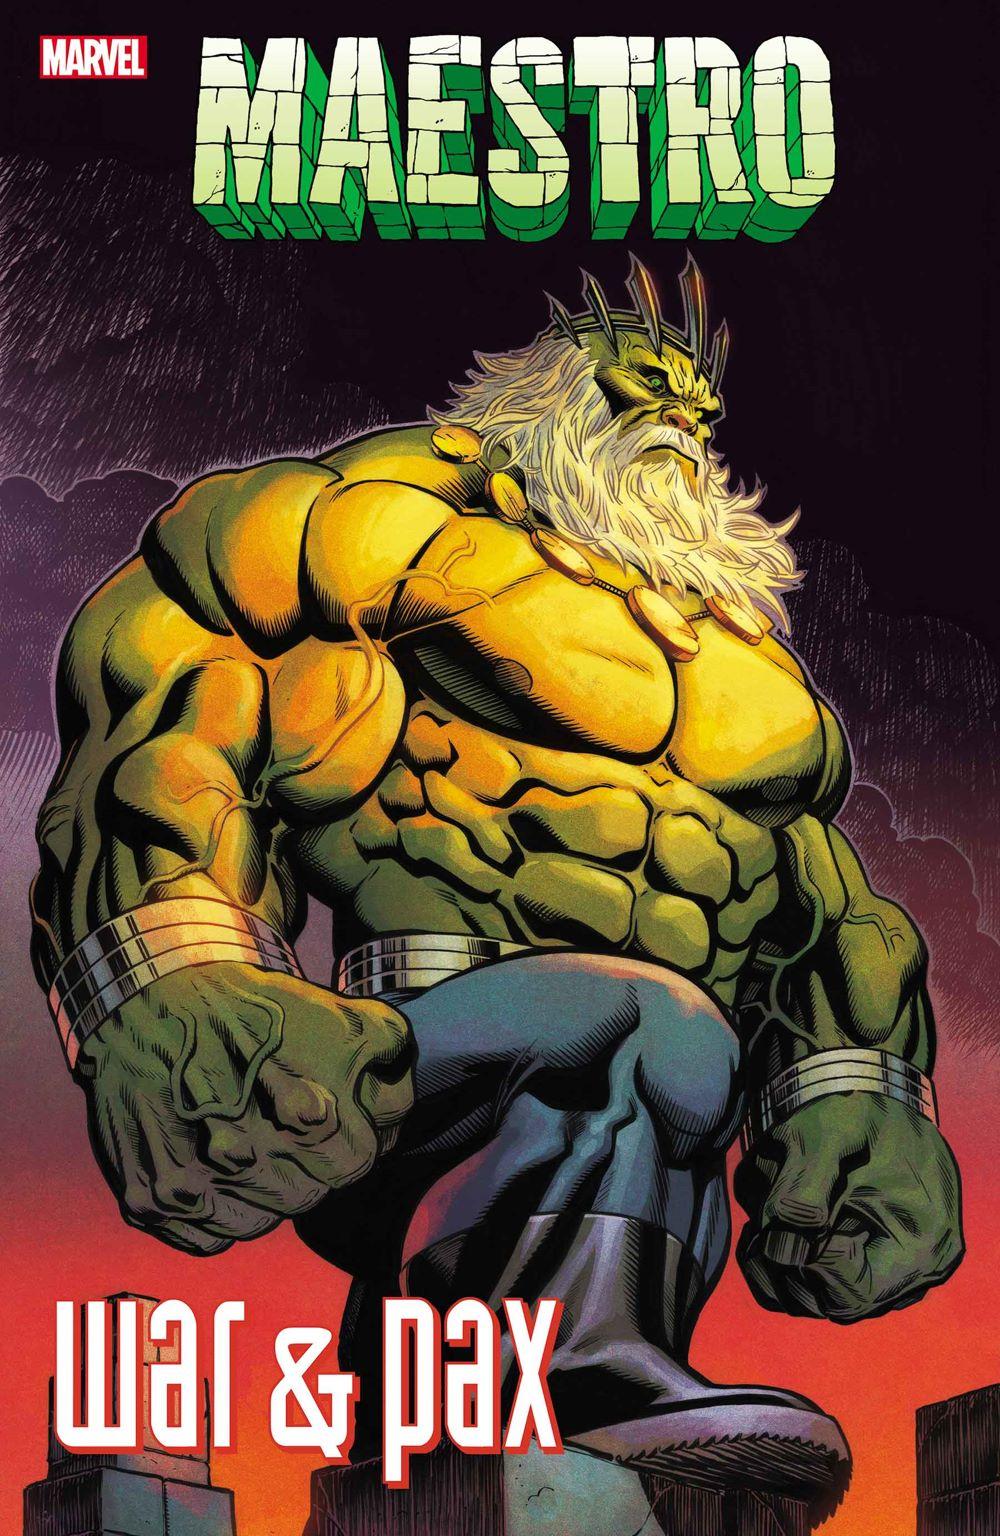 MAESTROWAP2021001_McGuinness Marvel Comics January 2021 Solicitations